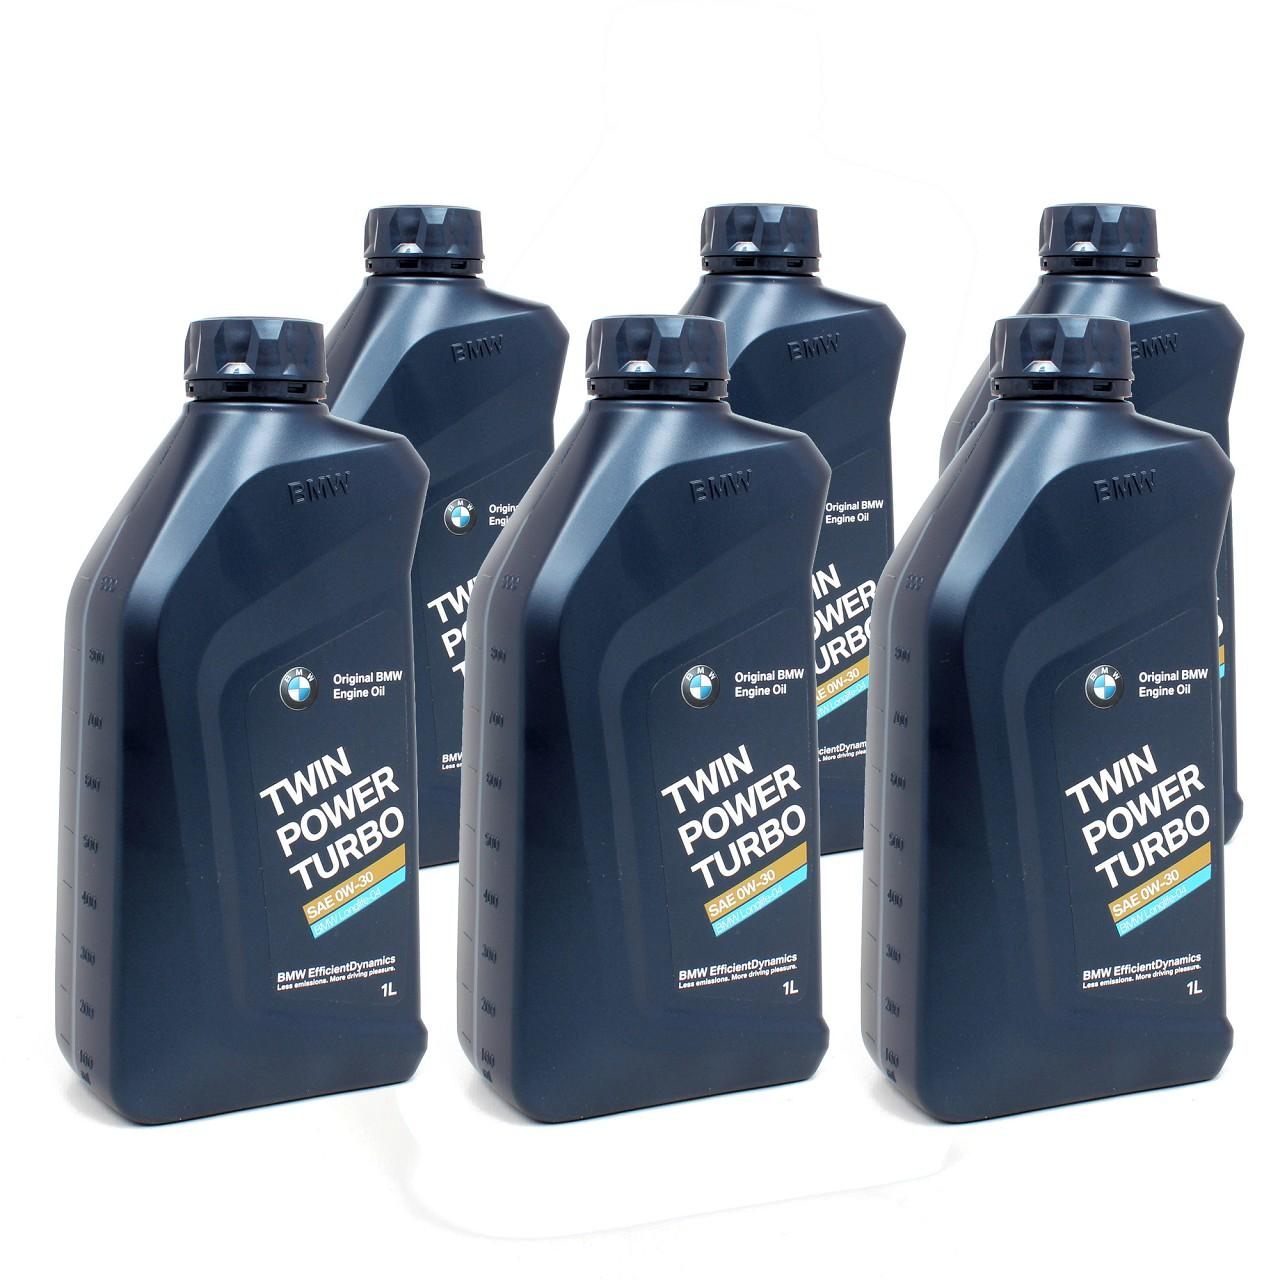 ORIGINAL BMW Motoröl Öl 0W30 Twin Power Turbo LongLife-04 6 Liter 83212465854